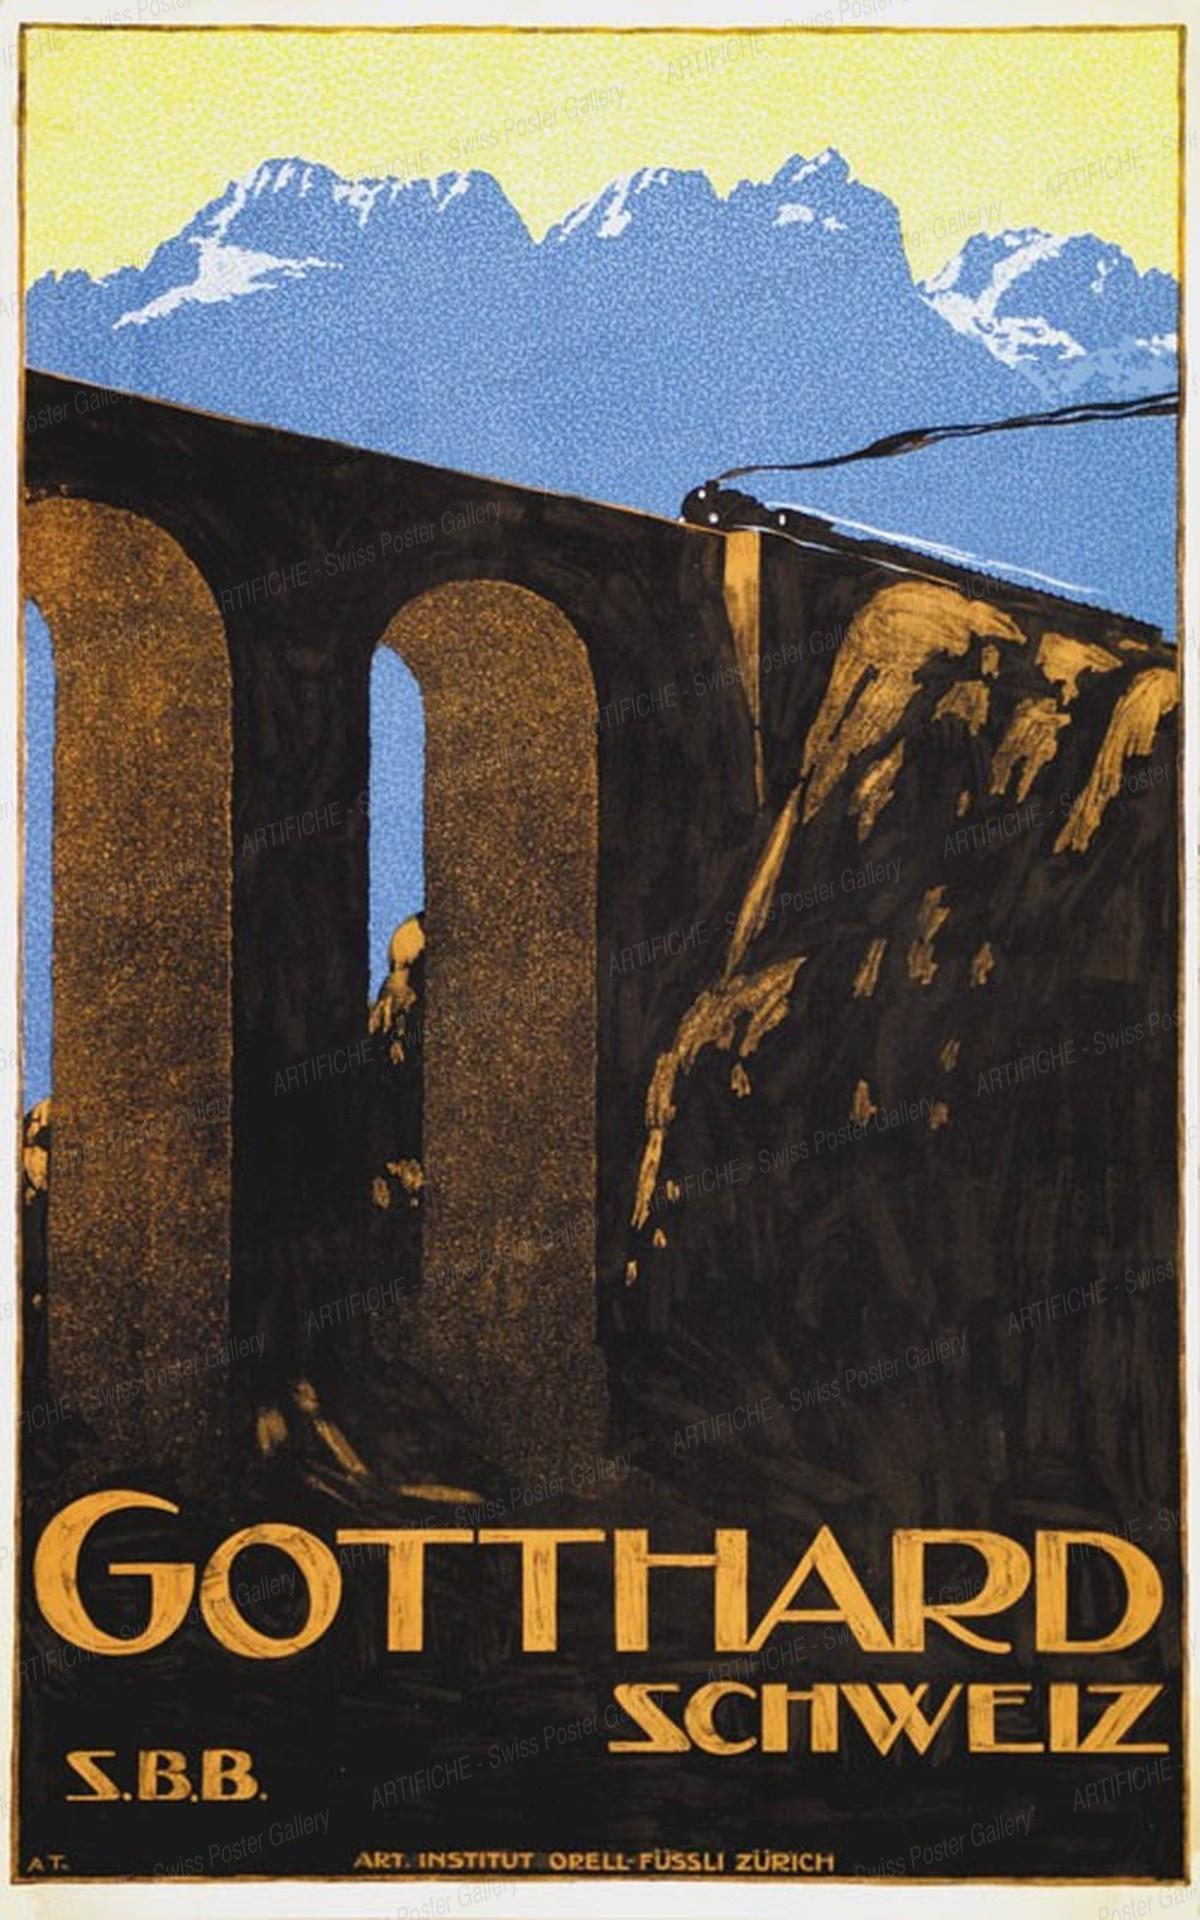 GOTTHARD – Schweiz – S.B.B., Anton Trieb